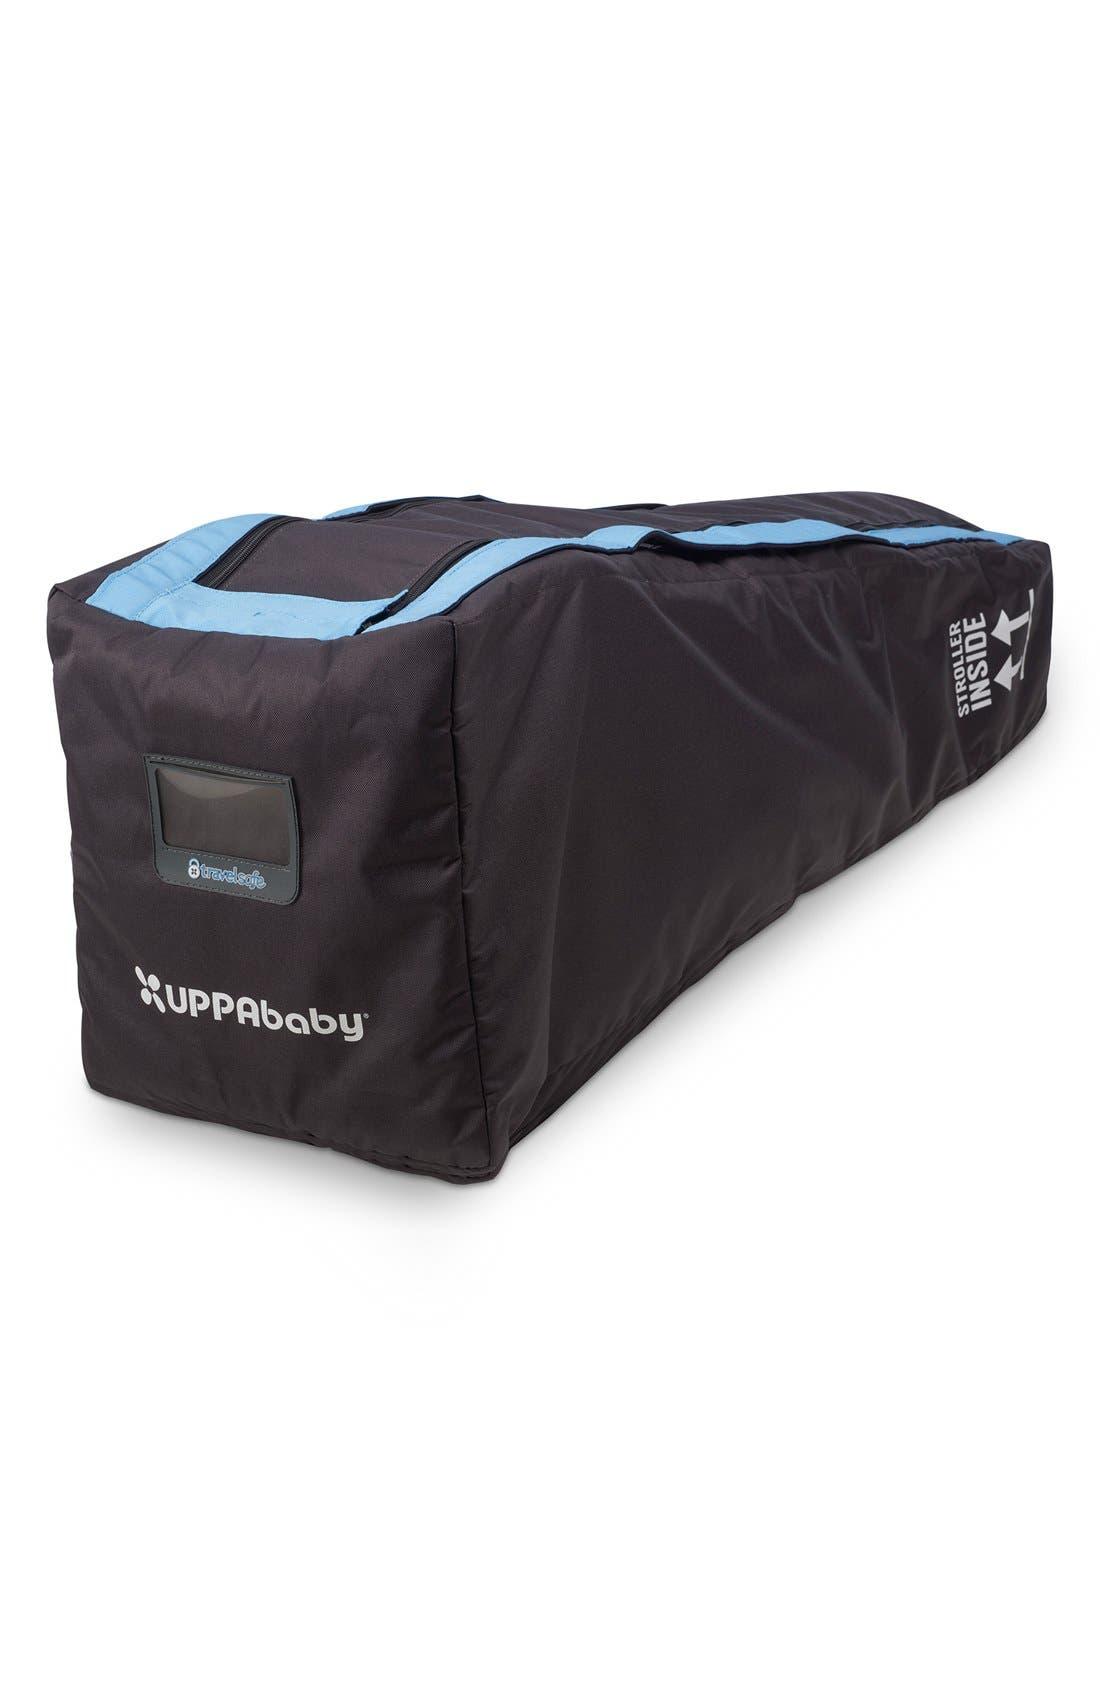 Main Image - UPPAbaby G-Series TravelSafe Travel Bag